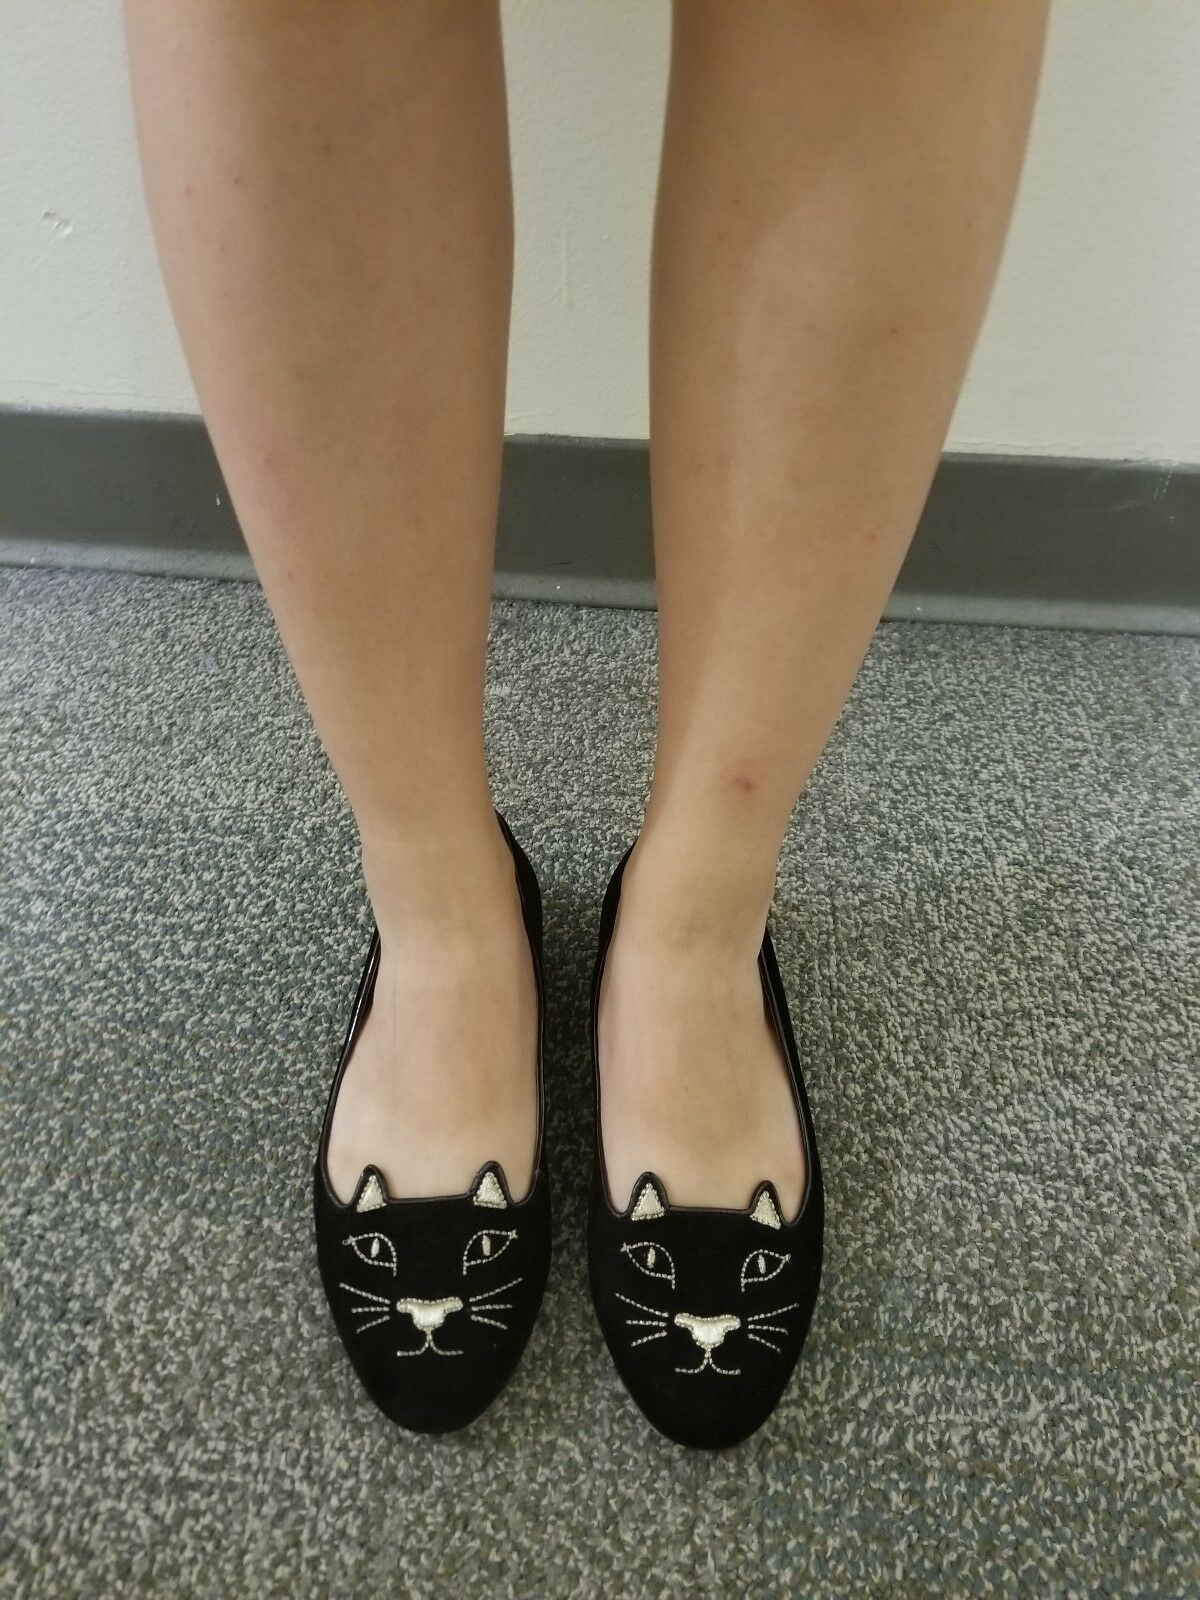 Charlotte Olympia kitty flats black Velvet 36, 6 6 6 studded heel 4a596a